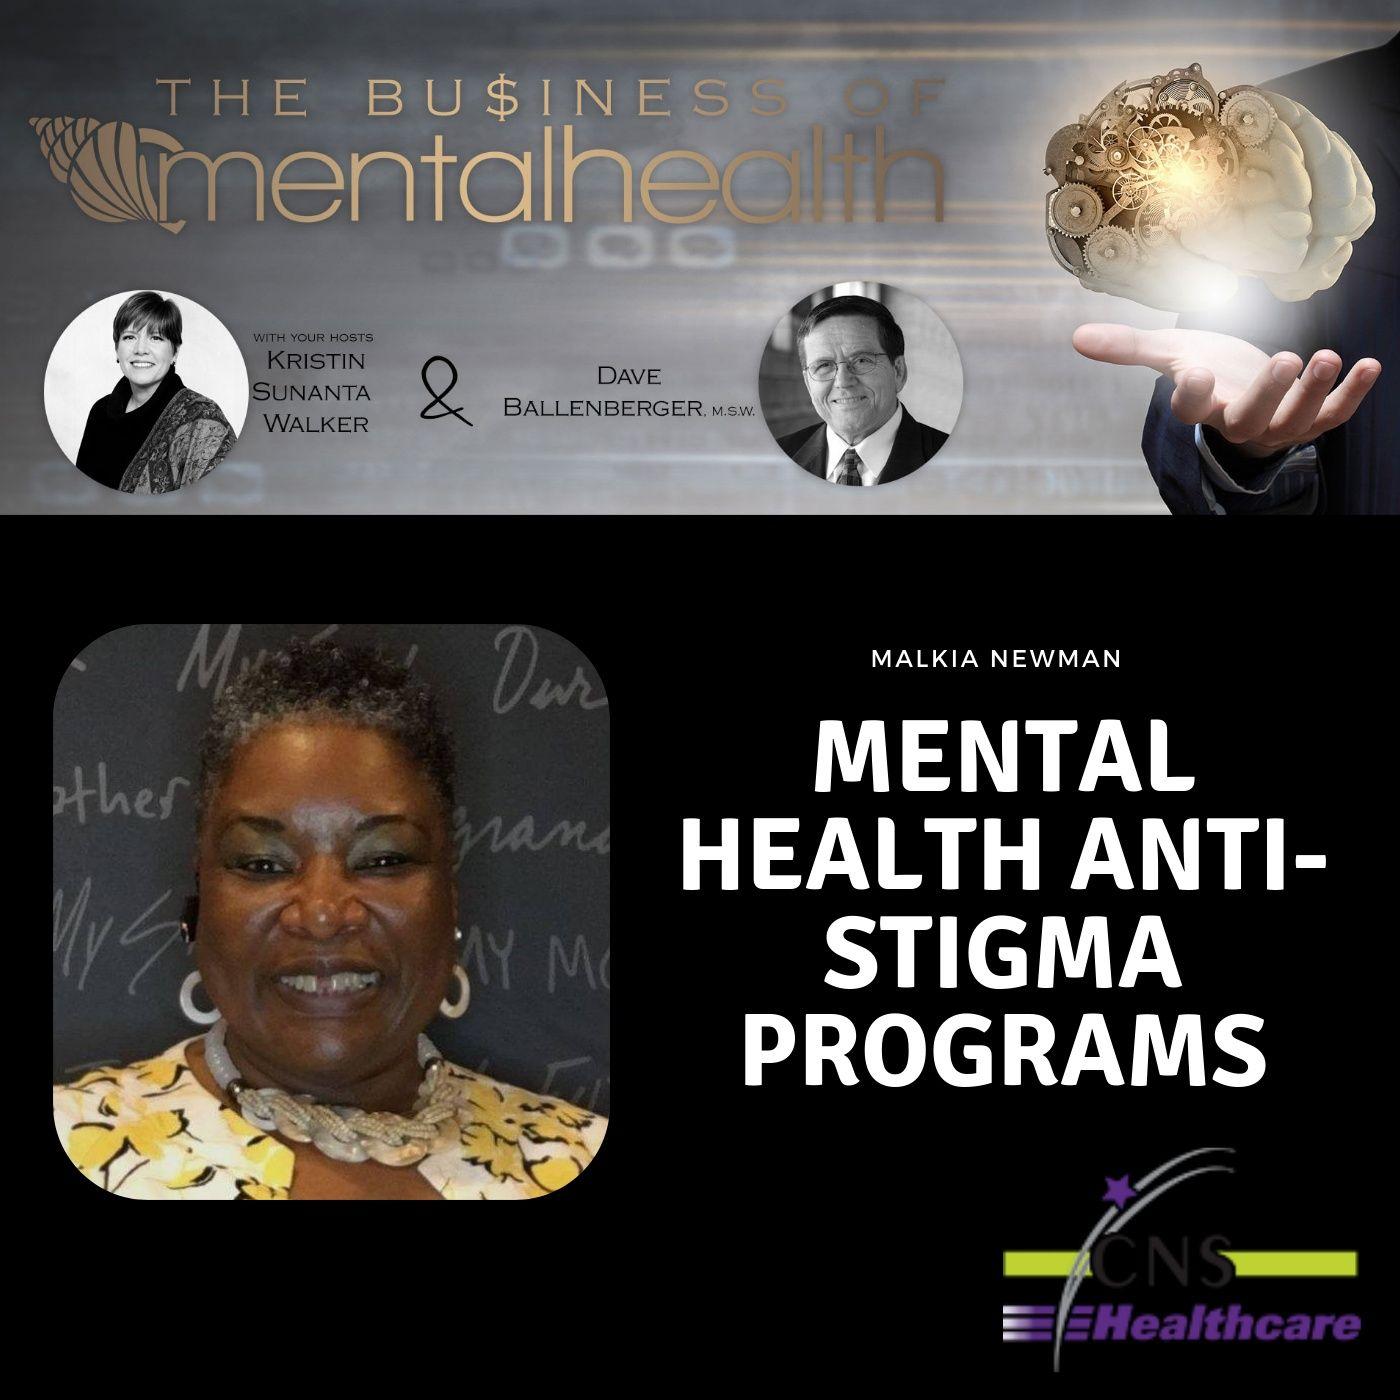 Mental Health News Radio - Mental Health Business: Anti-Stigma Programs with Malkia Newman